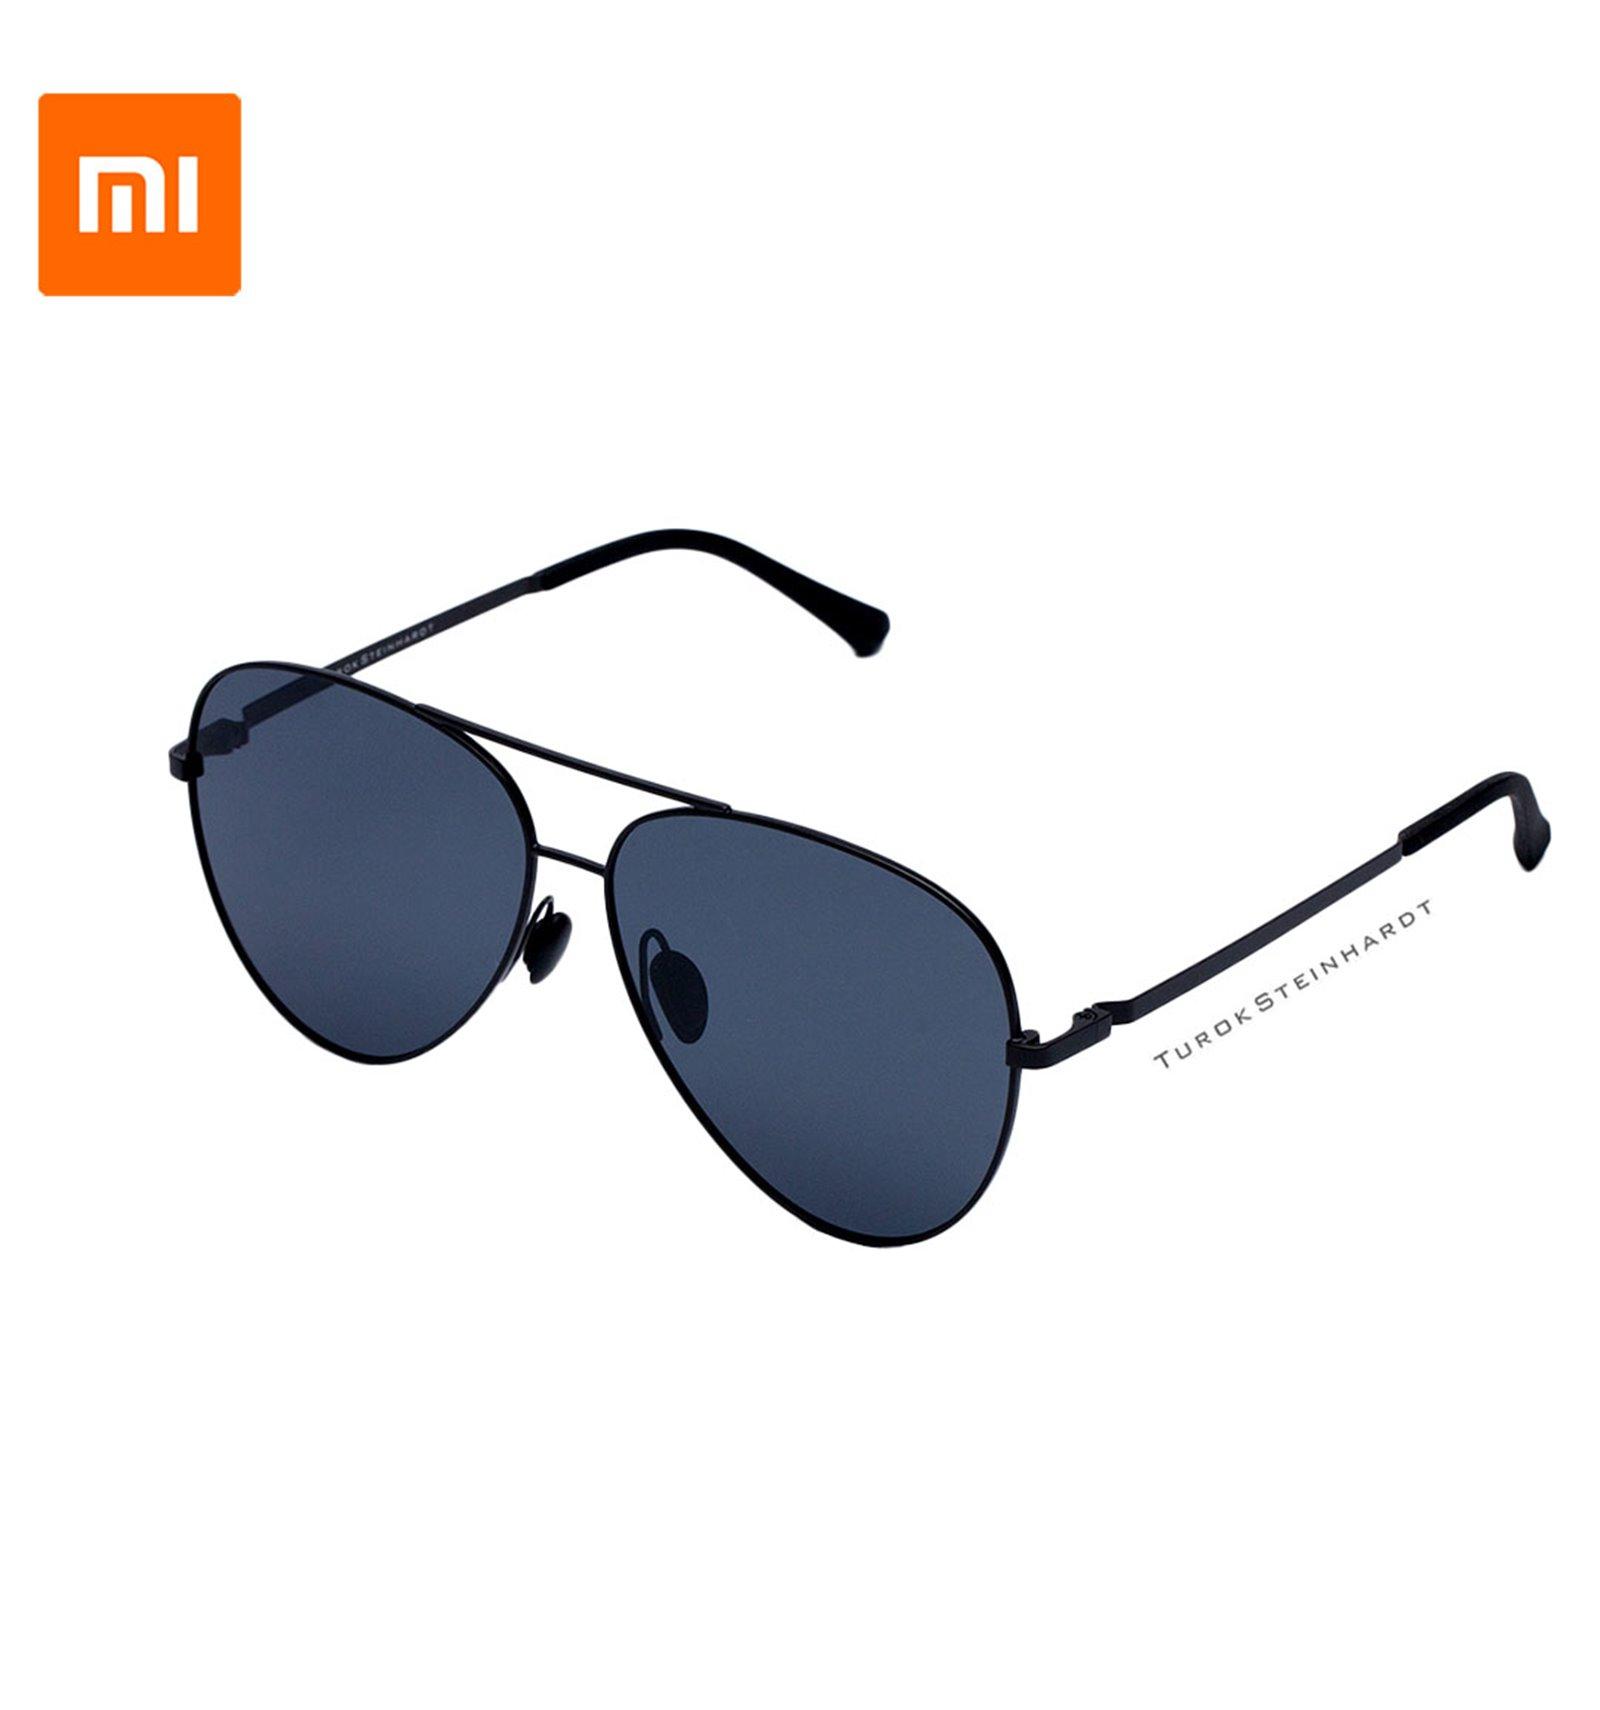 96c82809194 Xiaomi Turok Steinhardt UV400 sunglasses